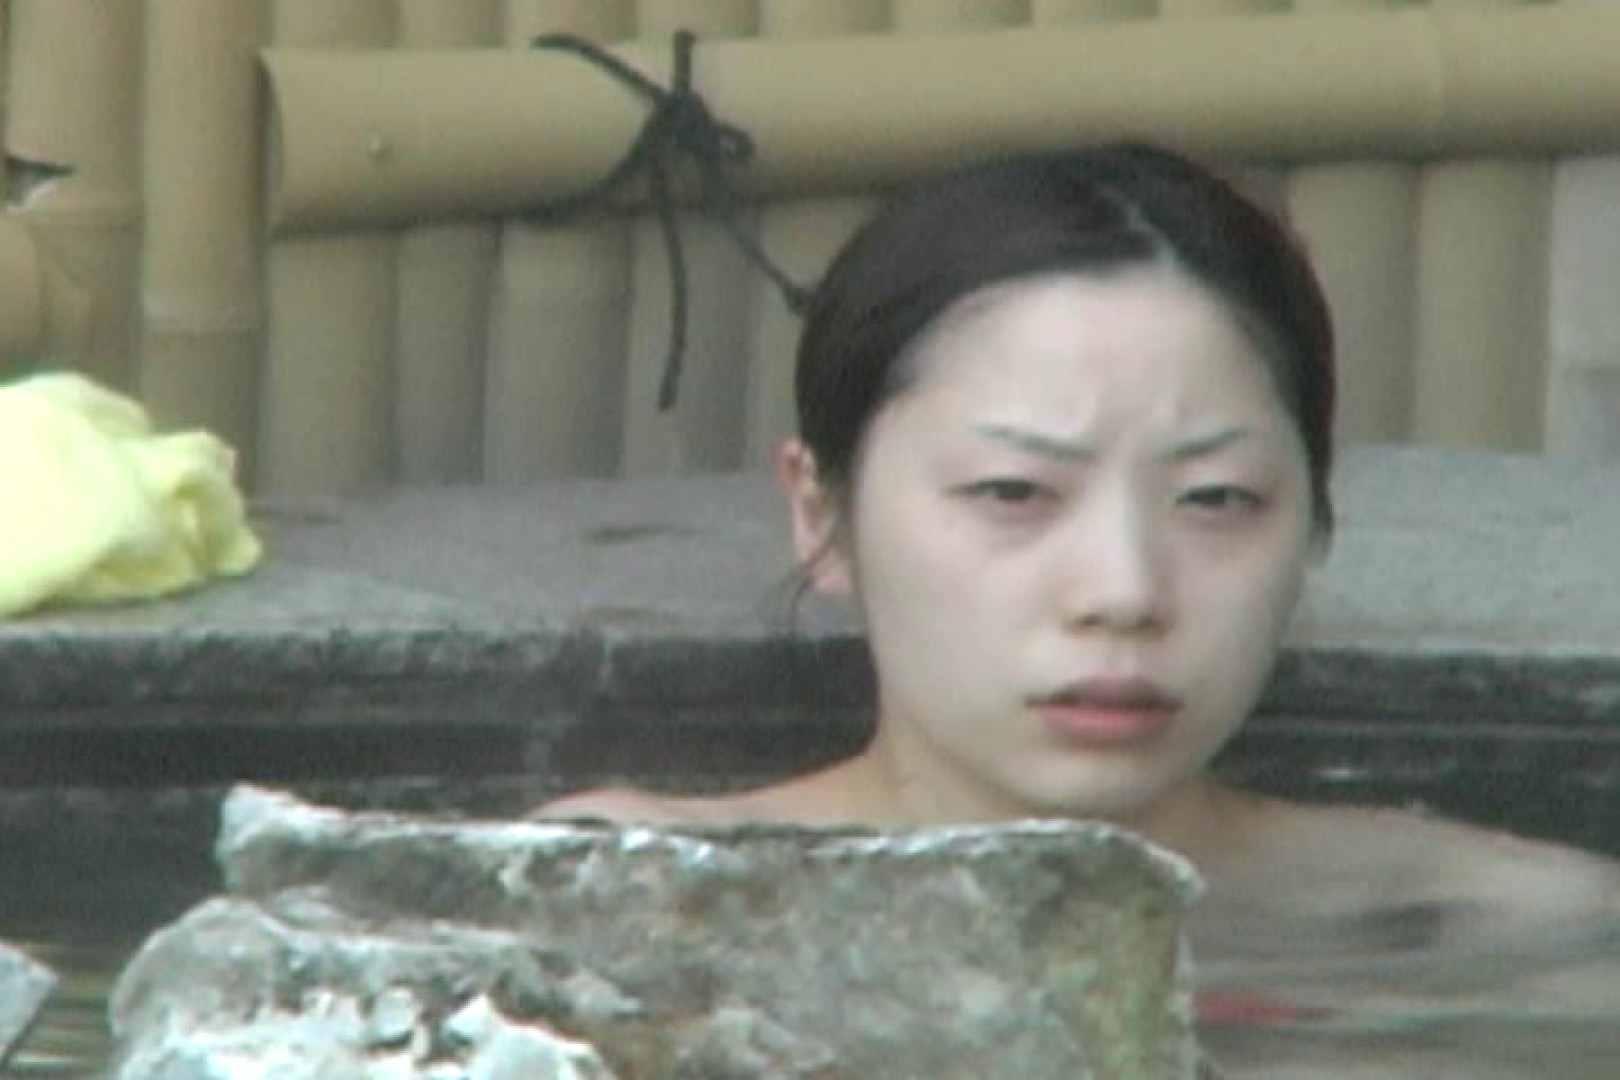 Aquaな露天風呂Vol.596 露天 覗きおまんこ画像 77画像 29